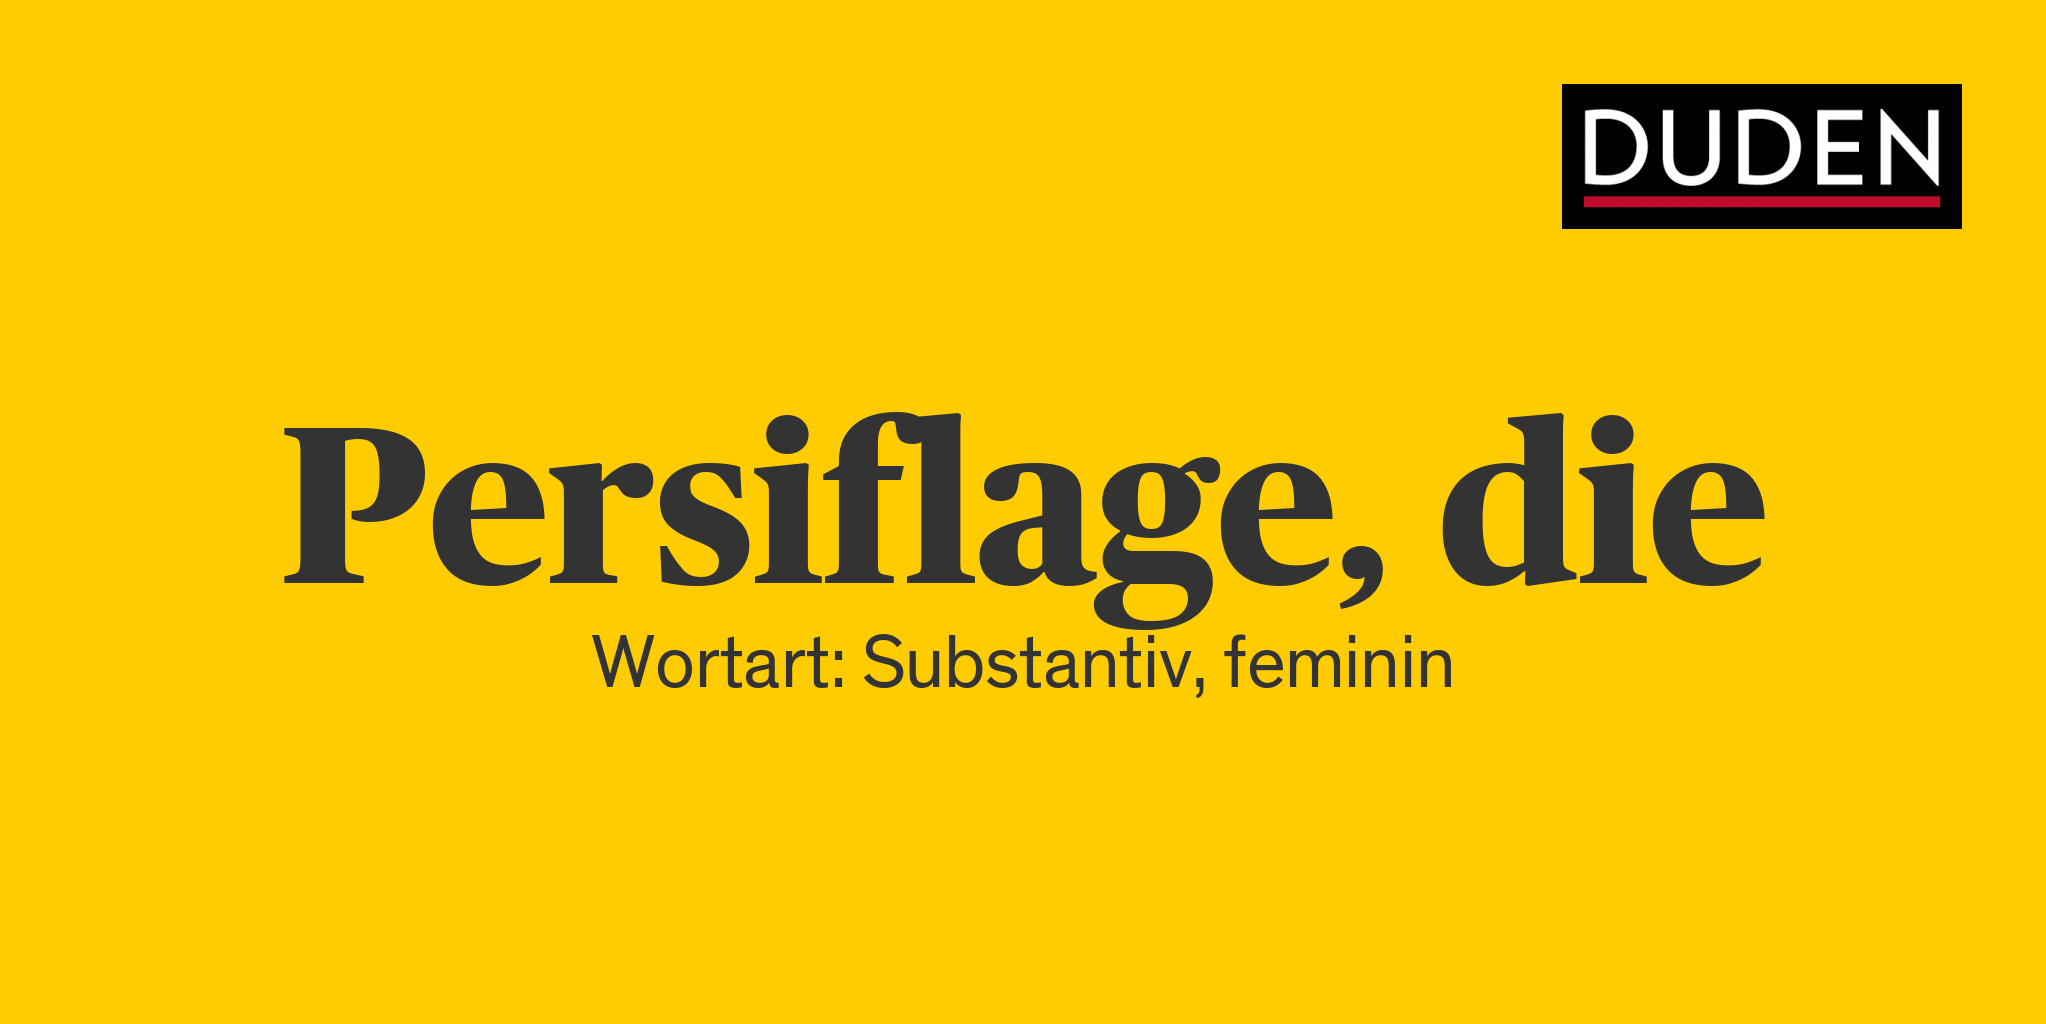 Duden Persiflage Rechtschreibung Bedeutung Definition Herkunft